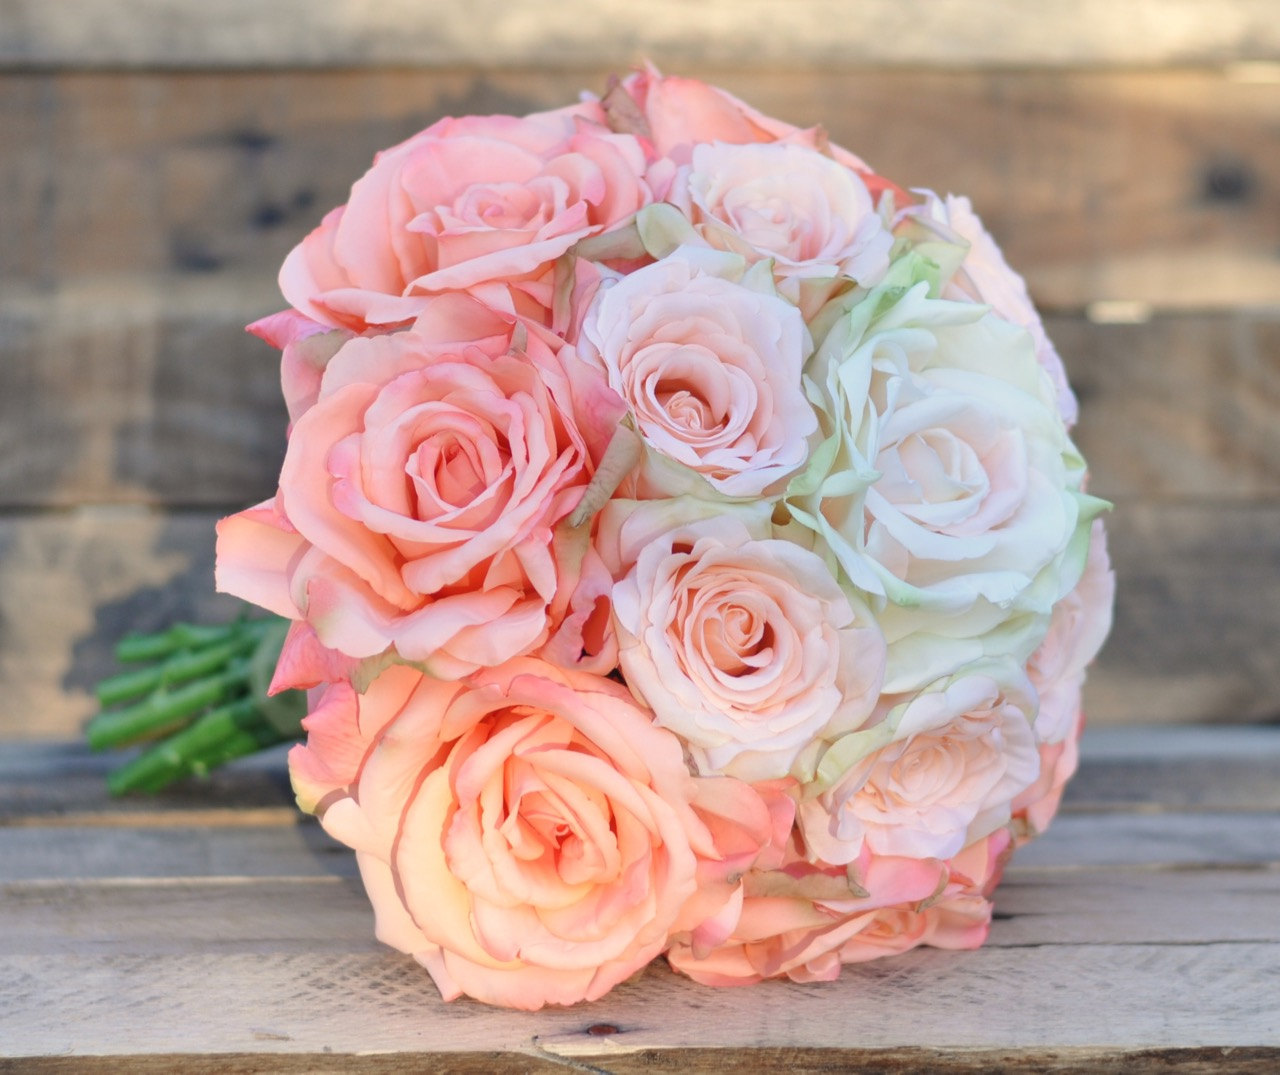 Ombre wedding bouquet